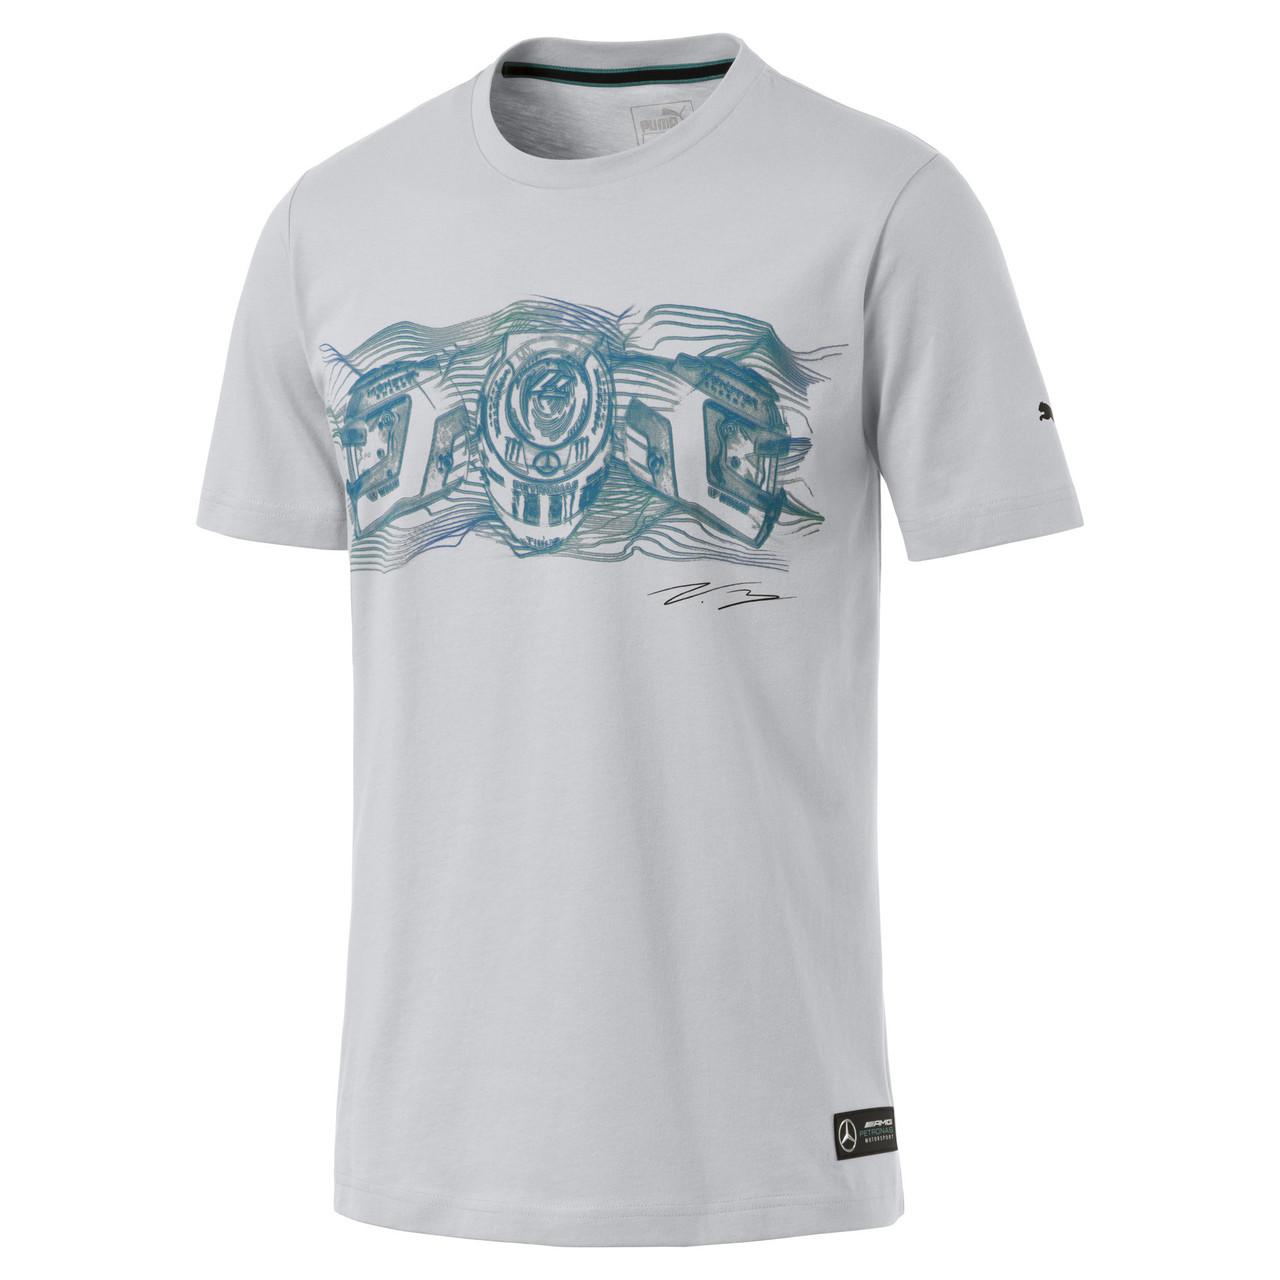 Мужская спортивная футболка Mapm Graphic Tee Driver 2